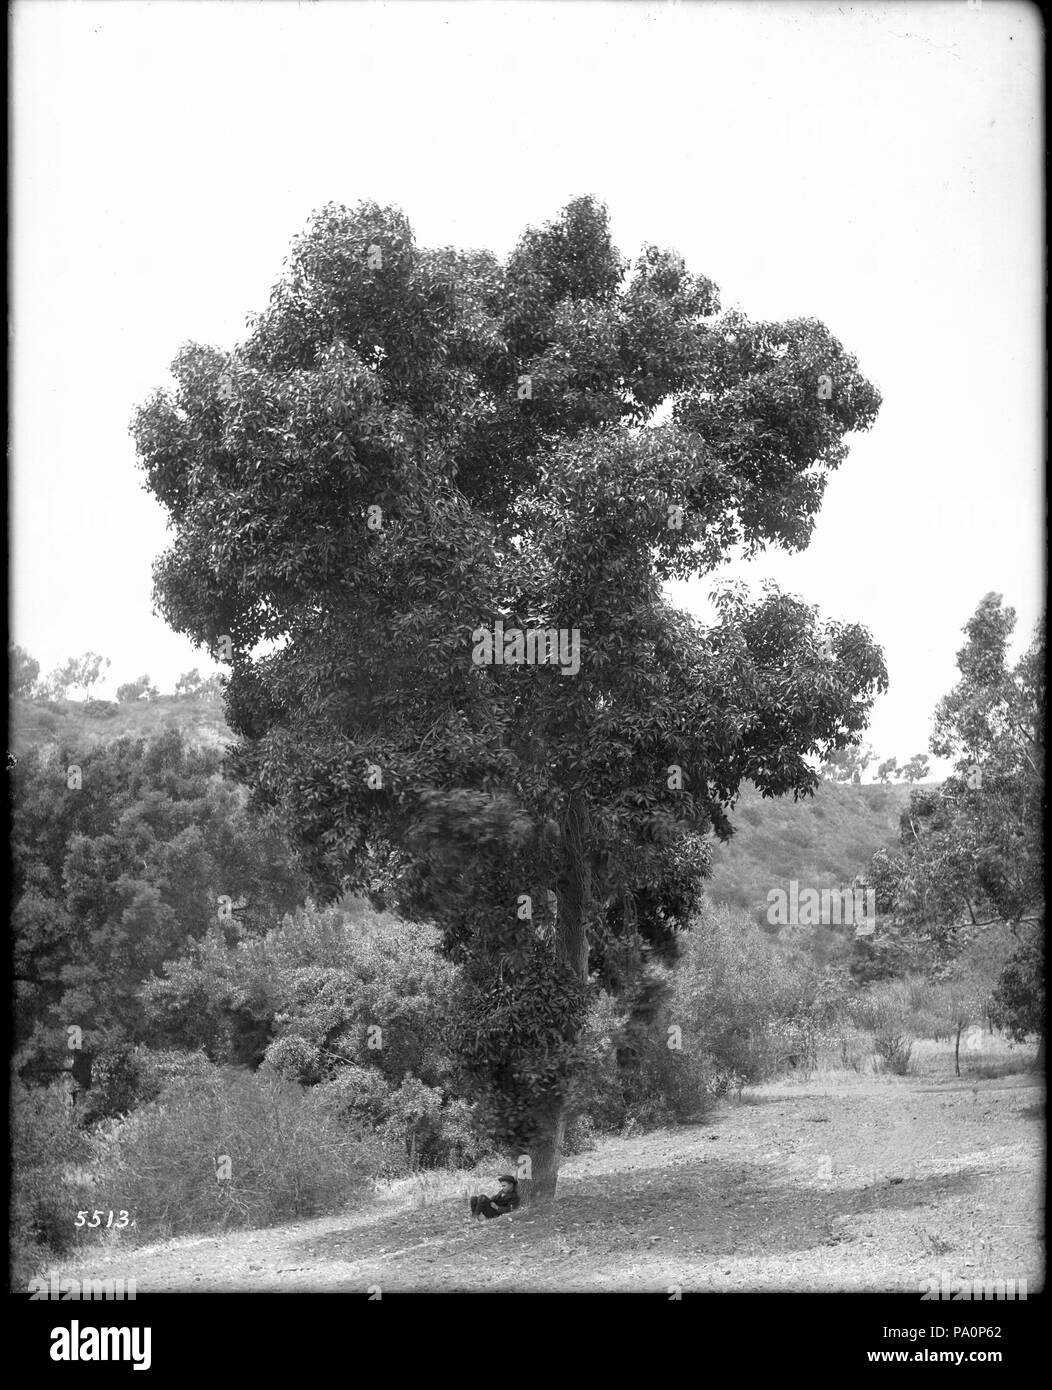 629 Eucalyptus trees, ca.1900 (CHS-5513) - Stock Image